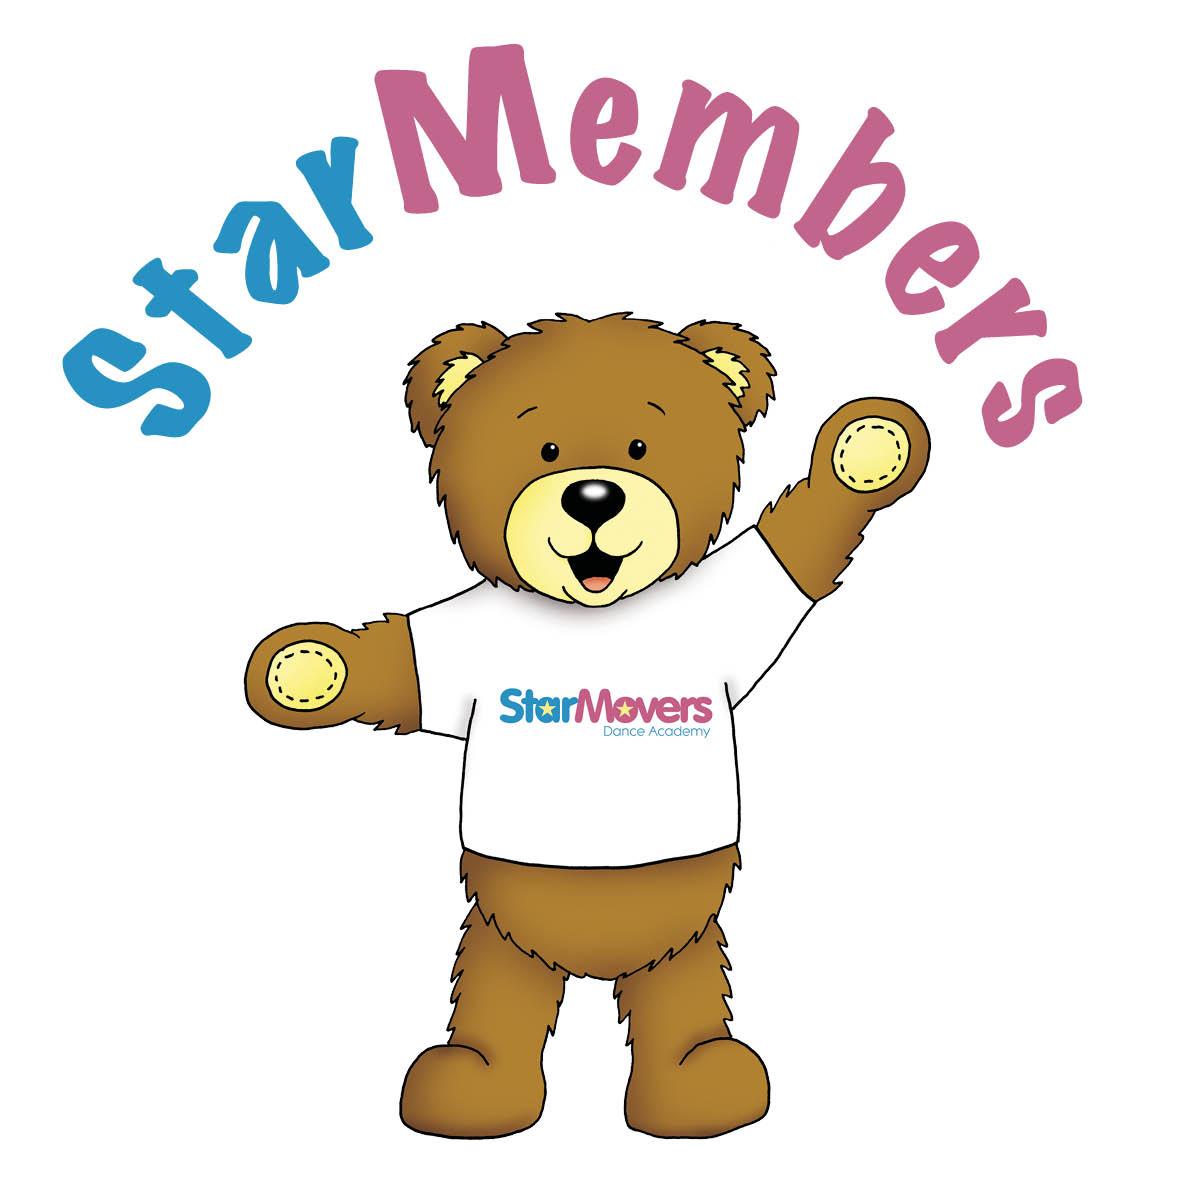 StarMovers